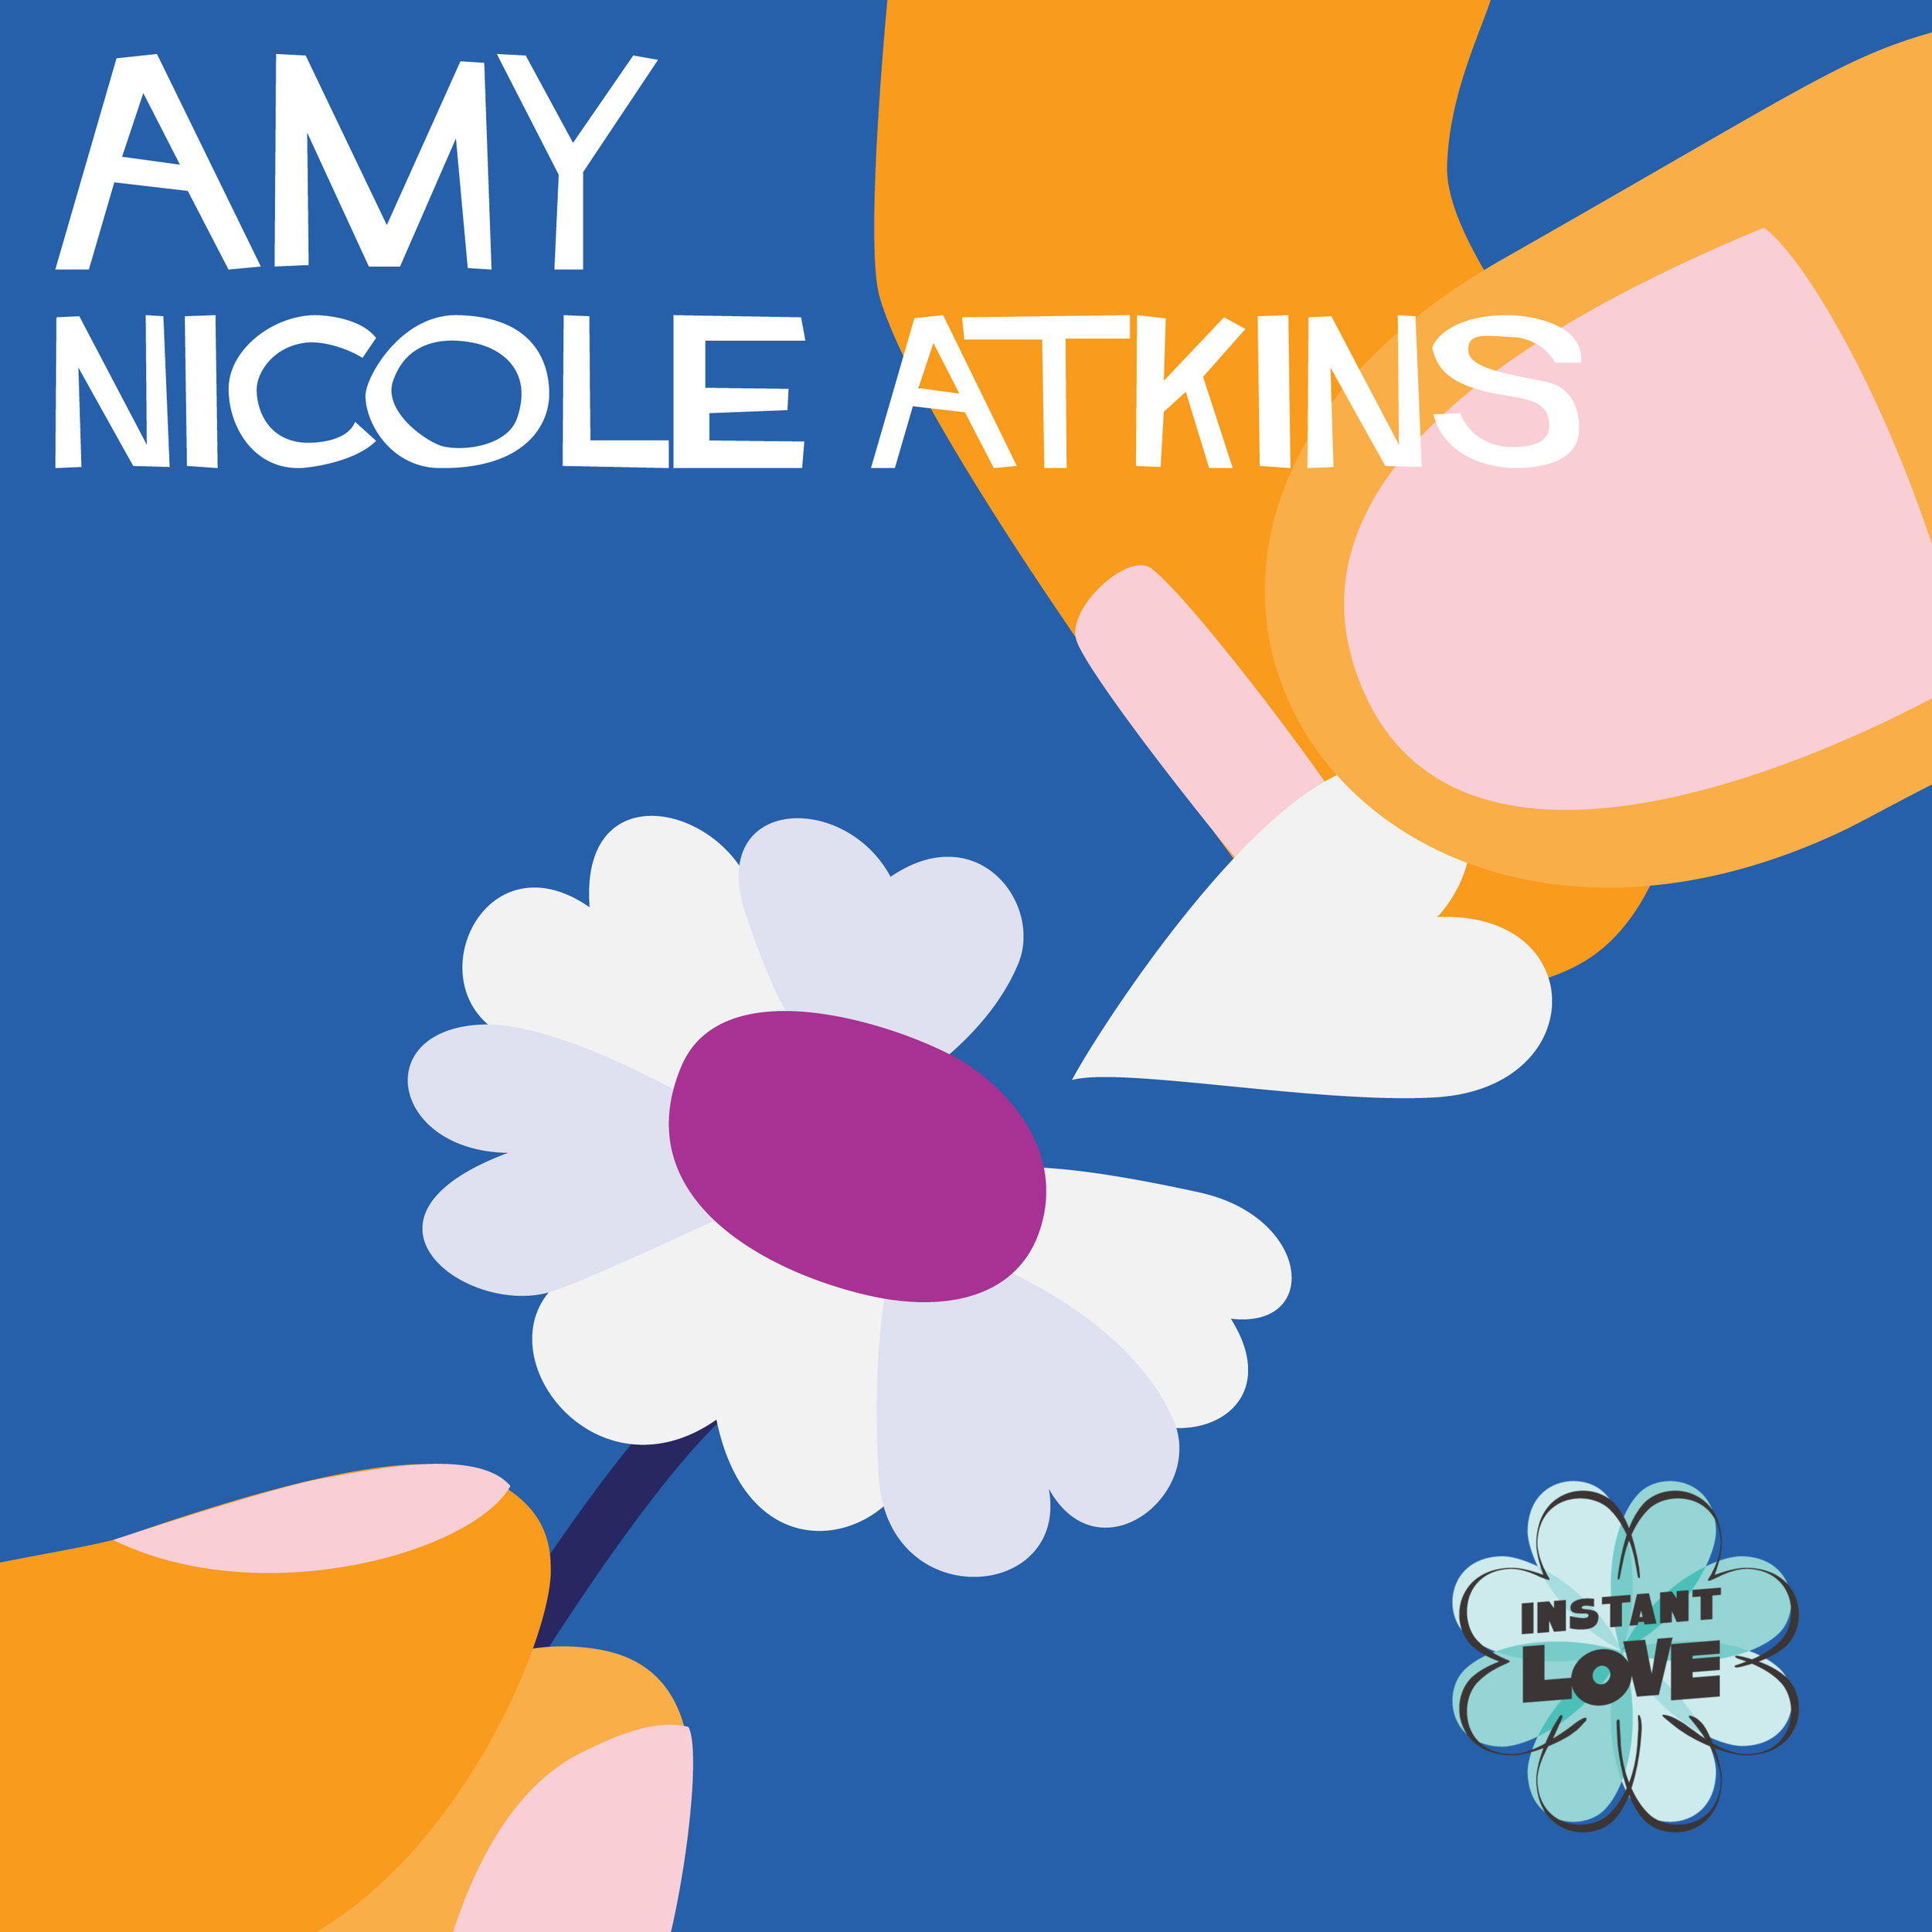 8-25_Amy_Nicole Atkins.jpg